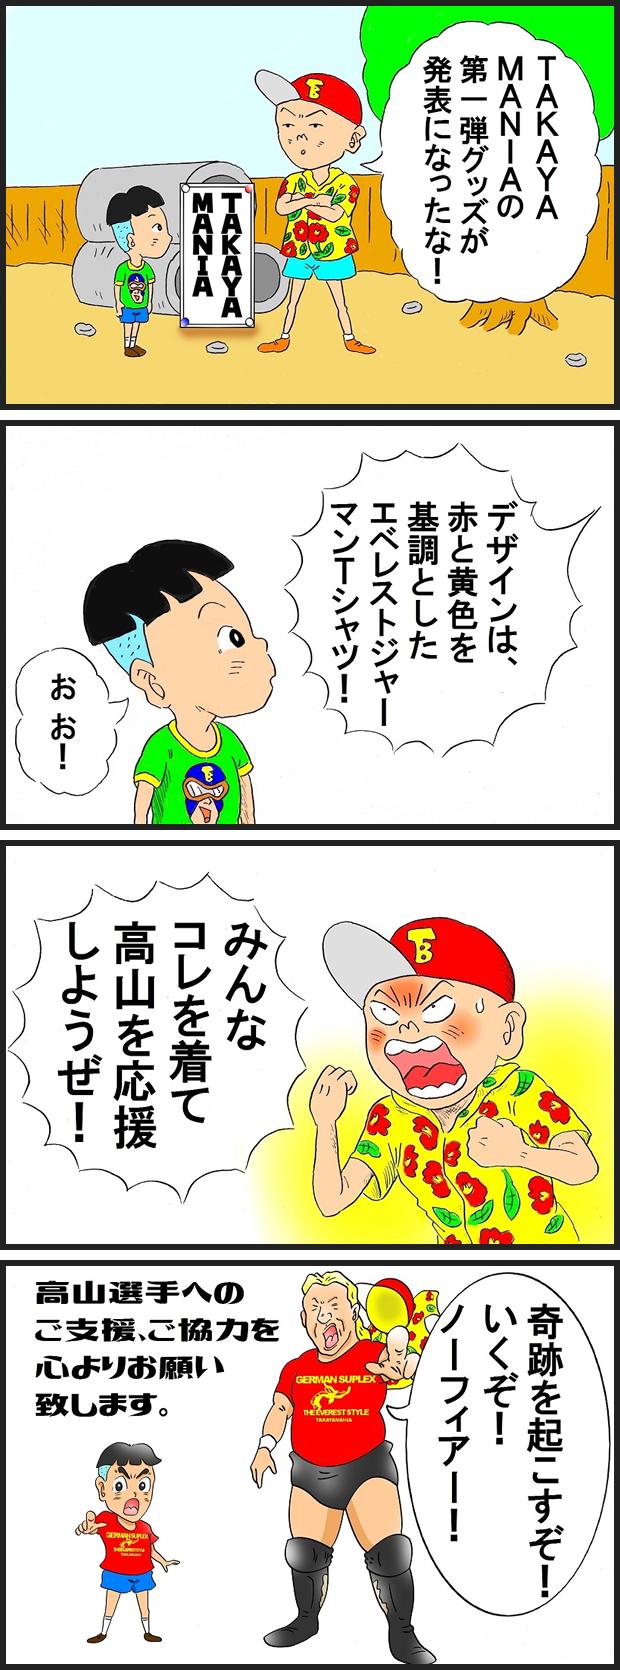 512 TAKAYAMANIA第1弾グッズ!